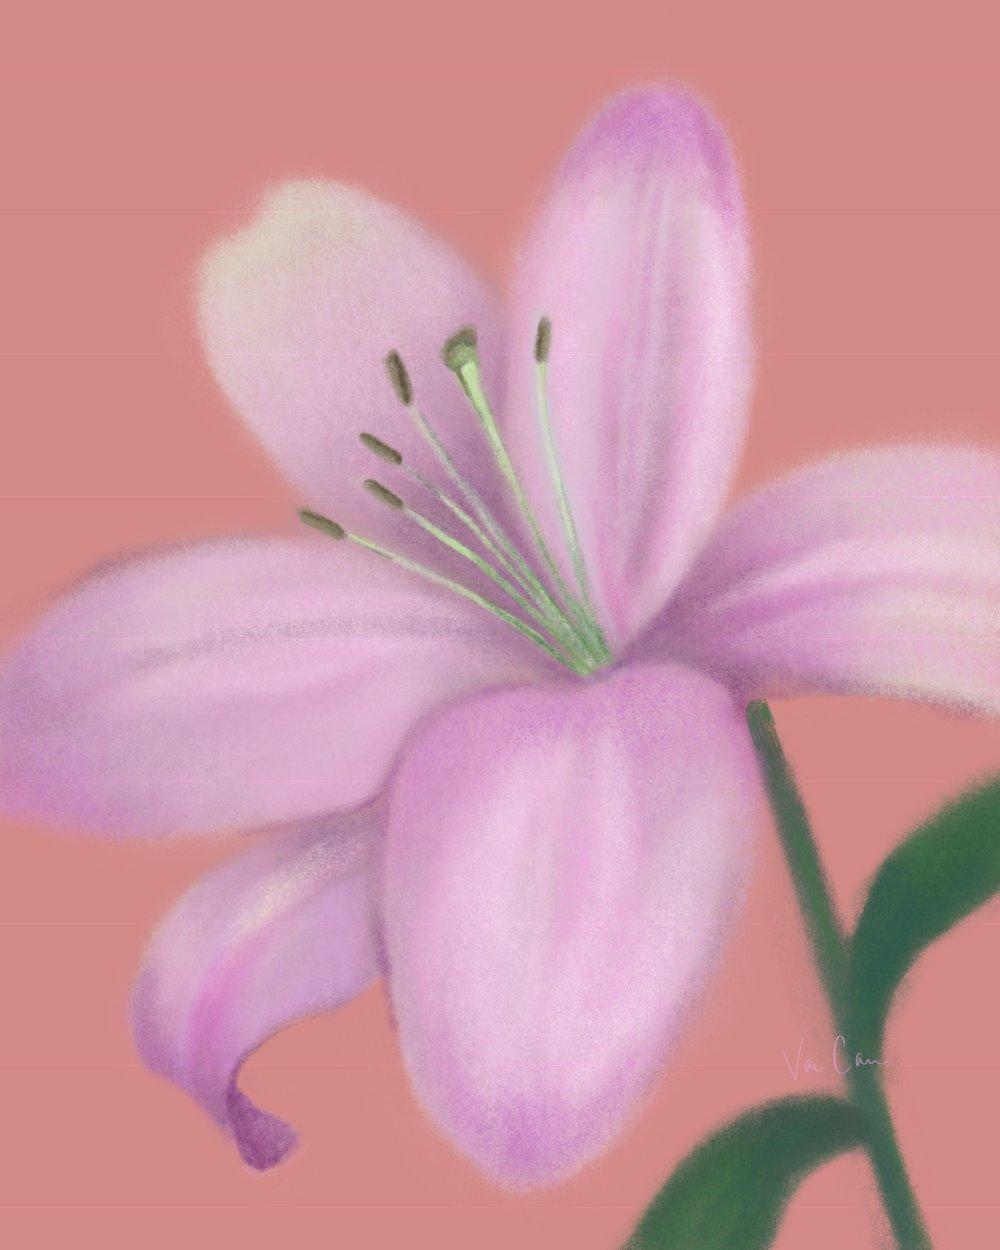 Light Purple Lily on Pink Background